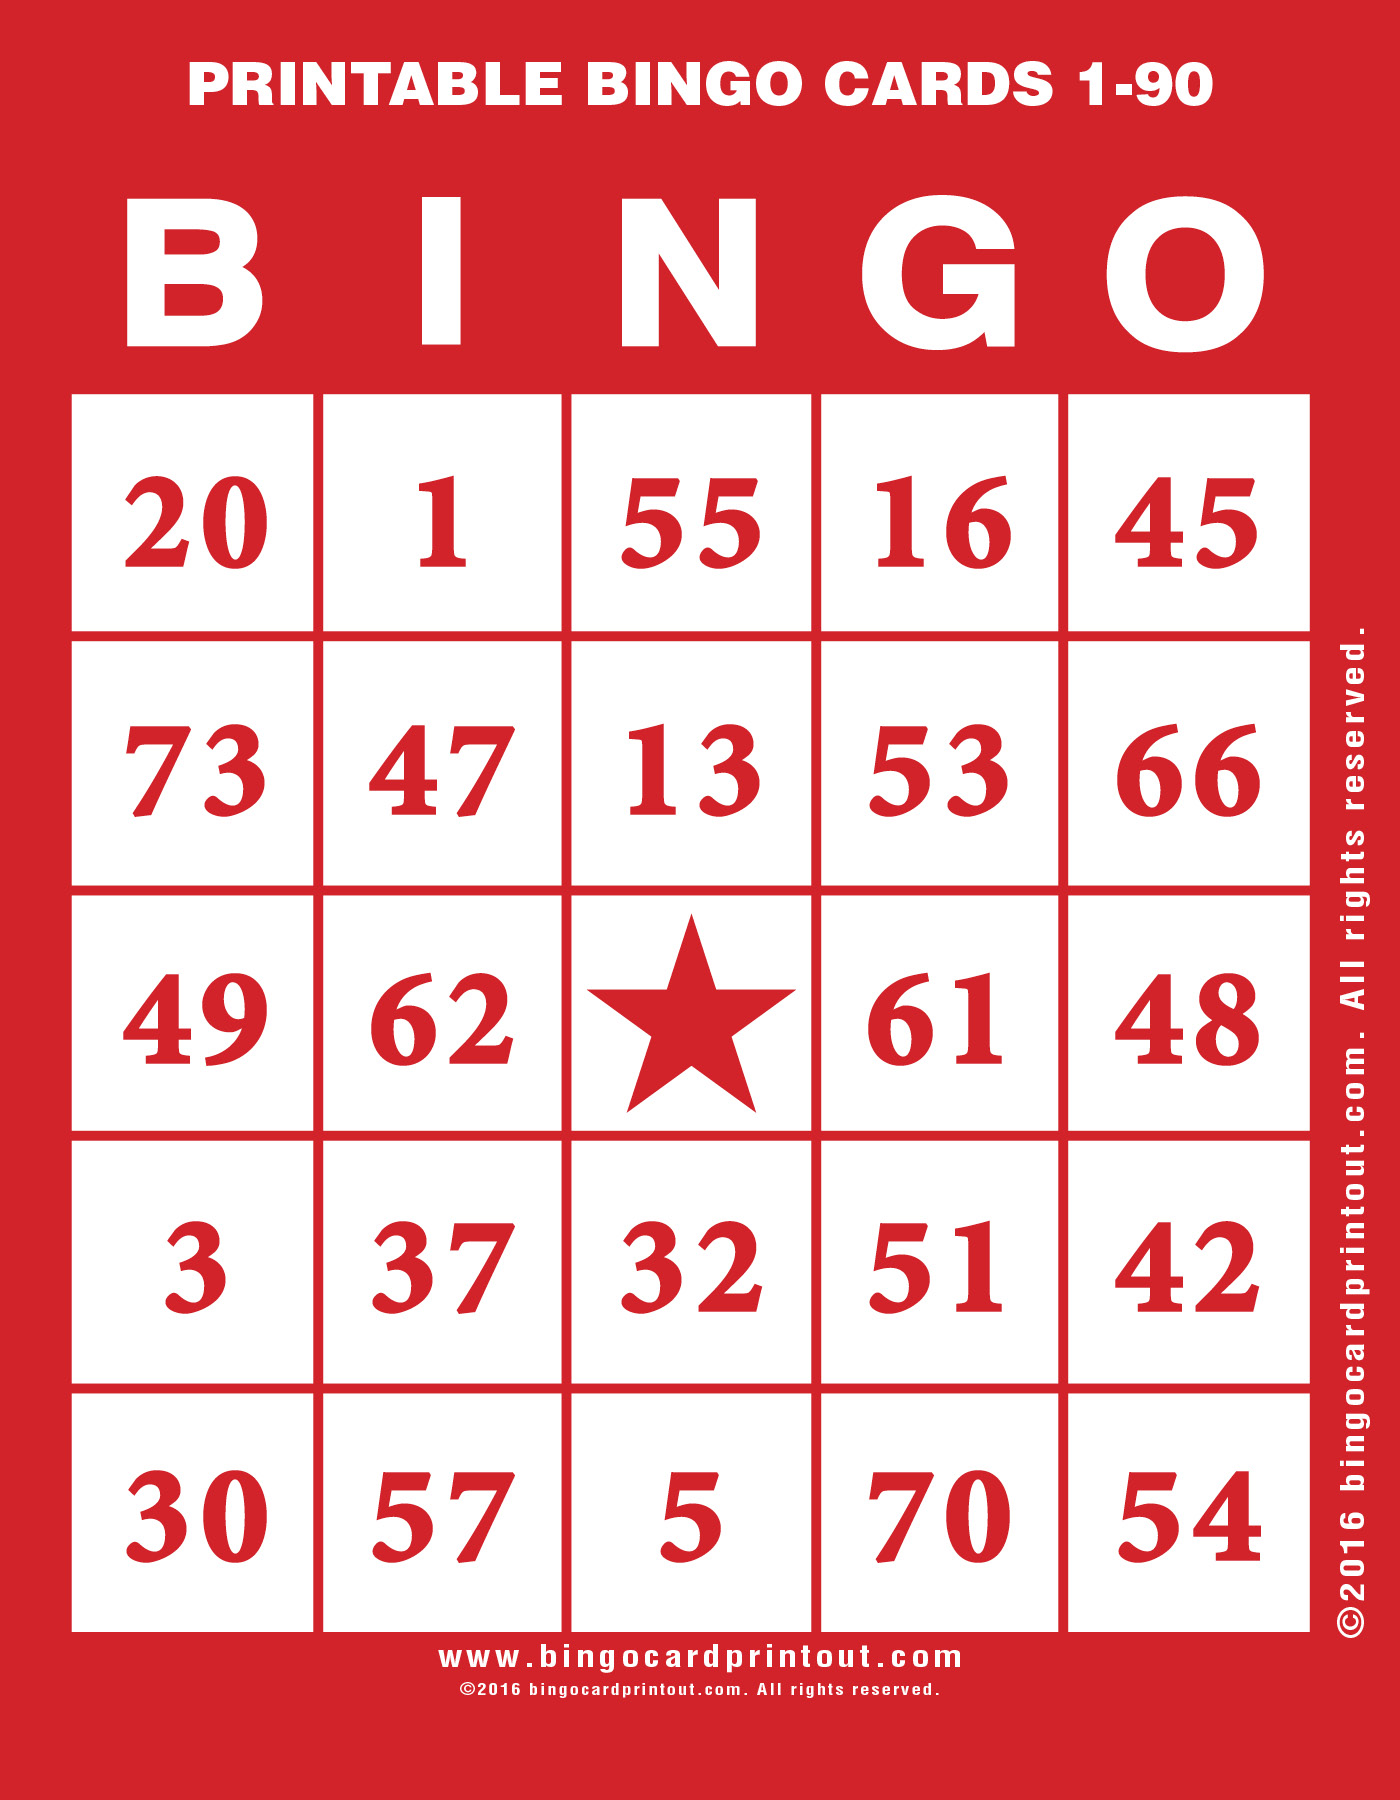 picture regarding Printable Number Bingo Cards identify Printable Bingo Playing cards 1-90 -